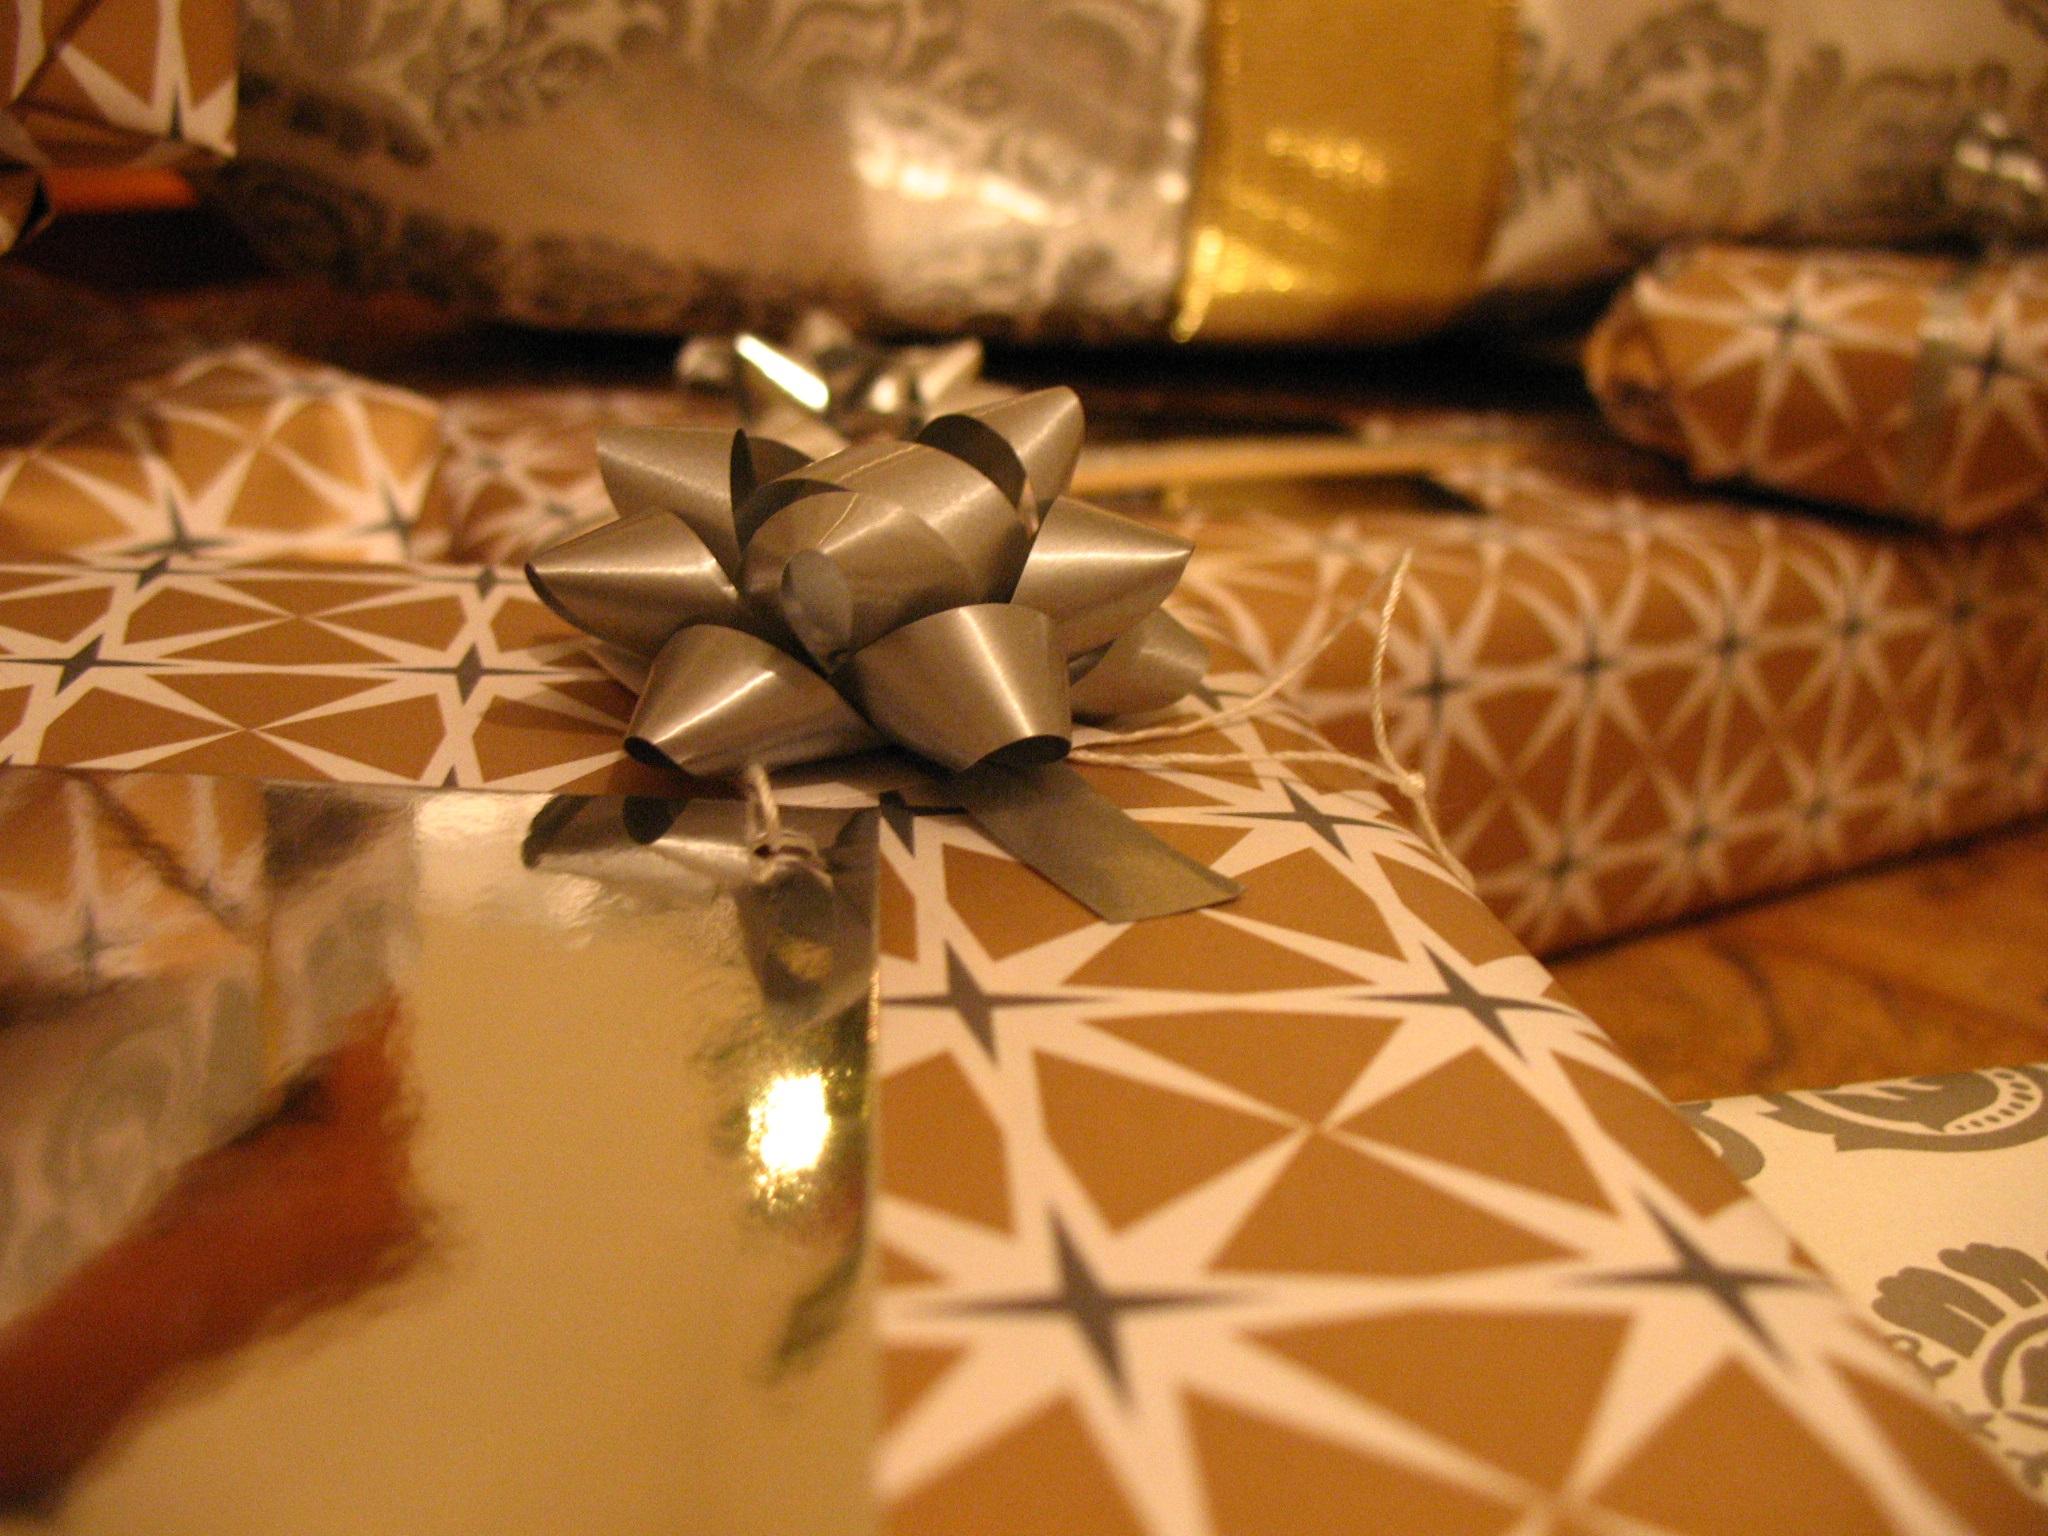 Sponsorship tops West Michigan Christmas lists